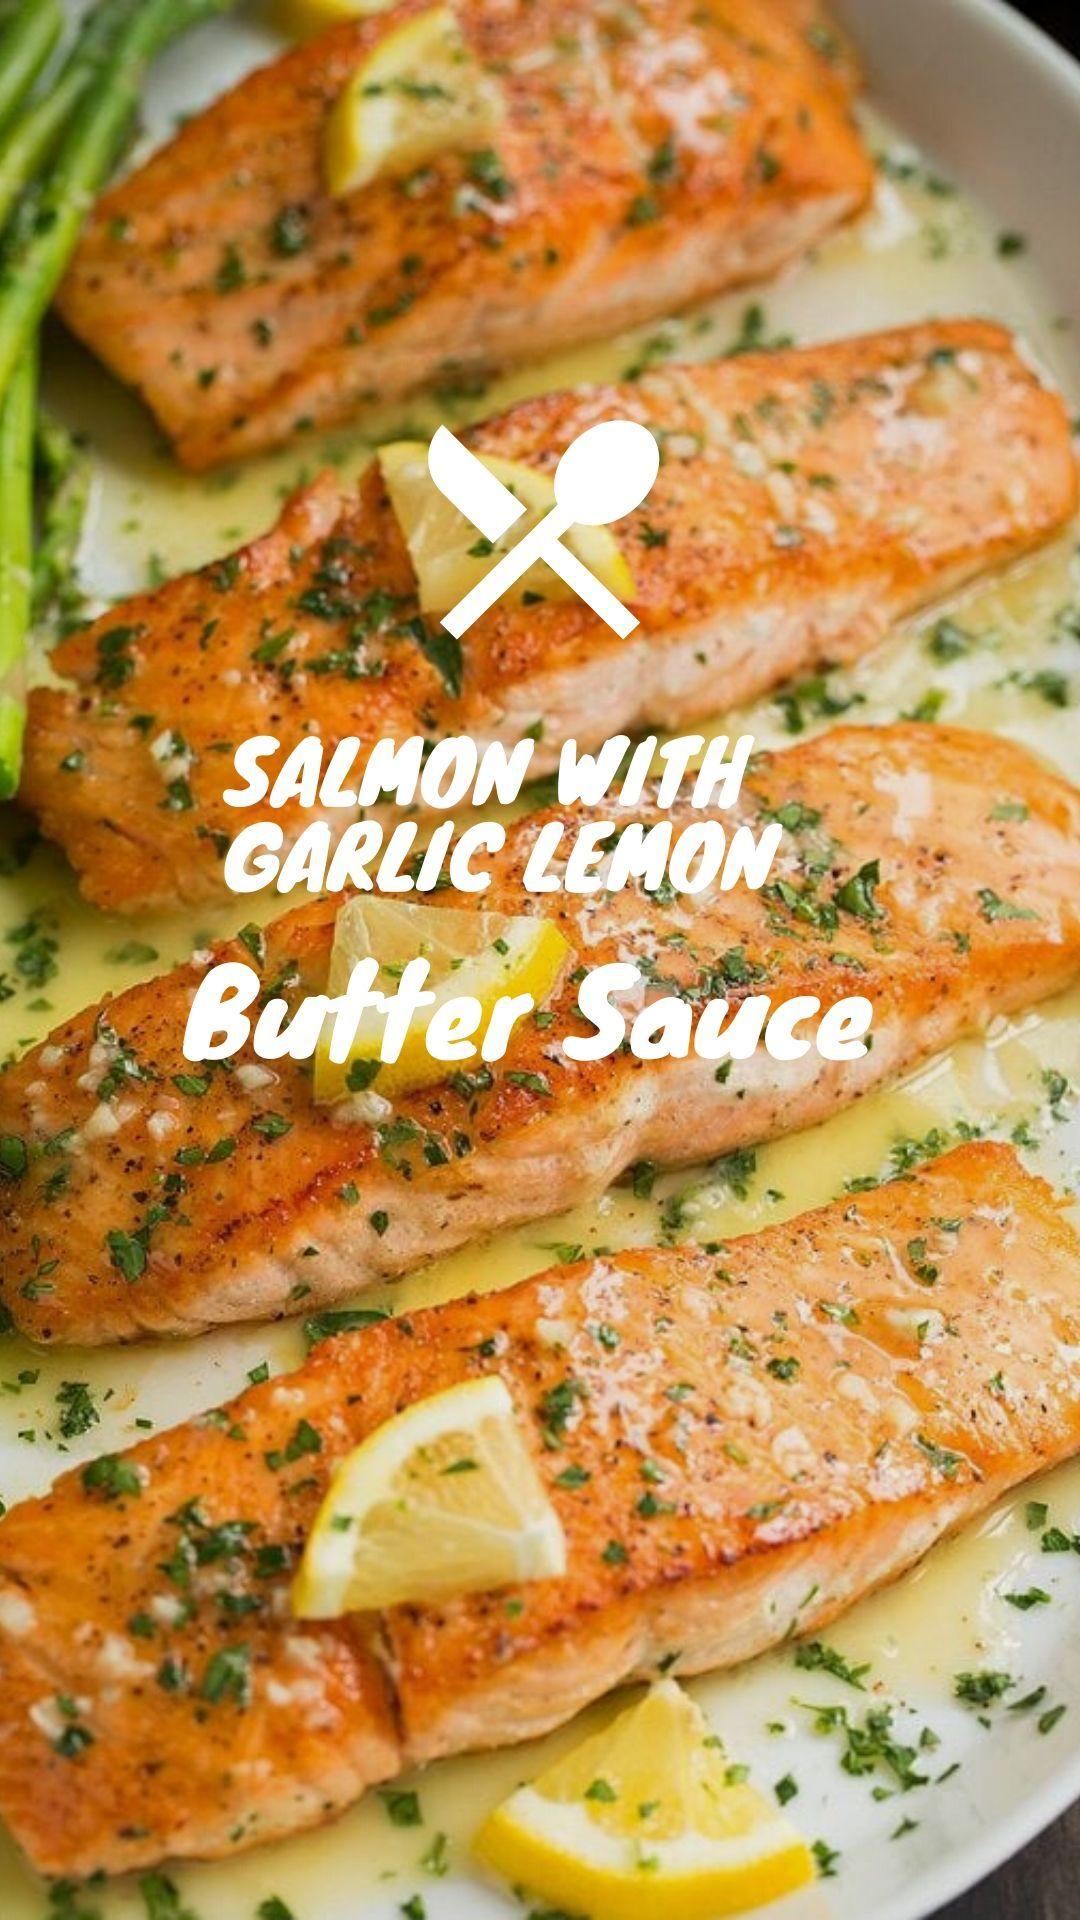 ★★★★★363 Salmon with Garlic Lemon Butter Sauce #Salmon #Garlic #Lemon #Butter #Sauce